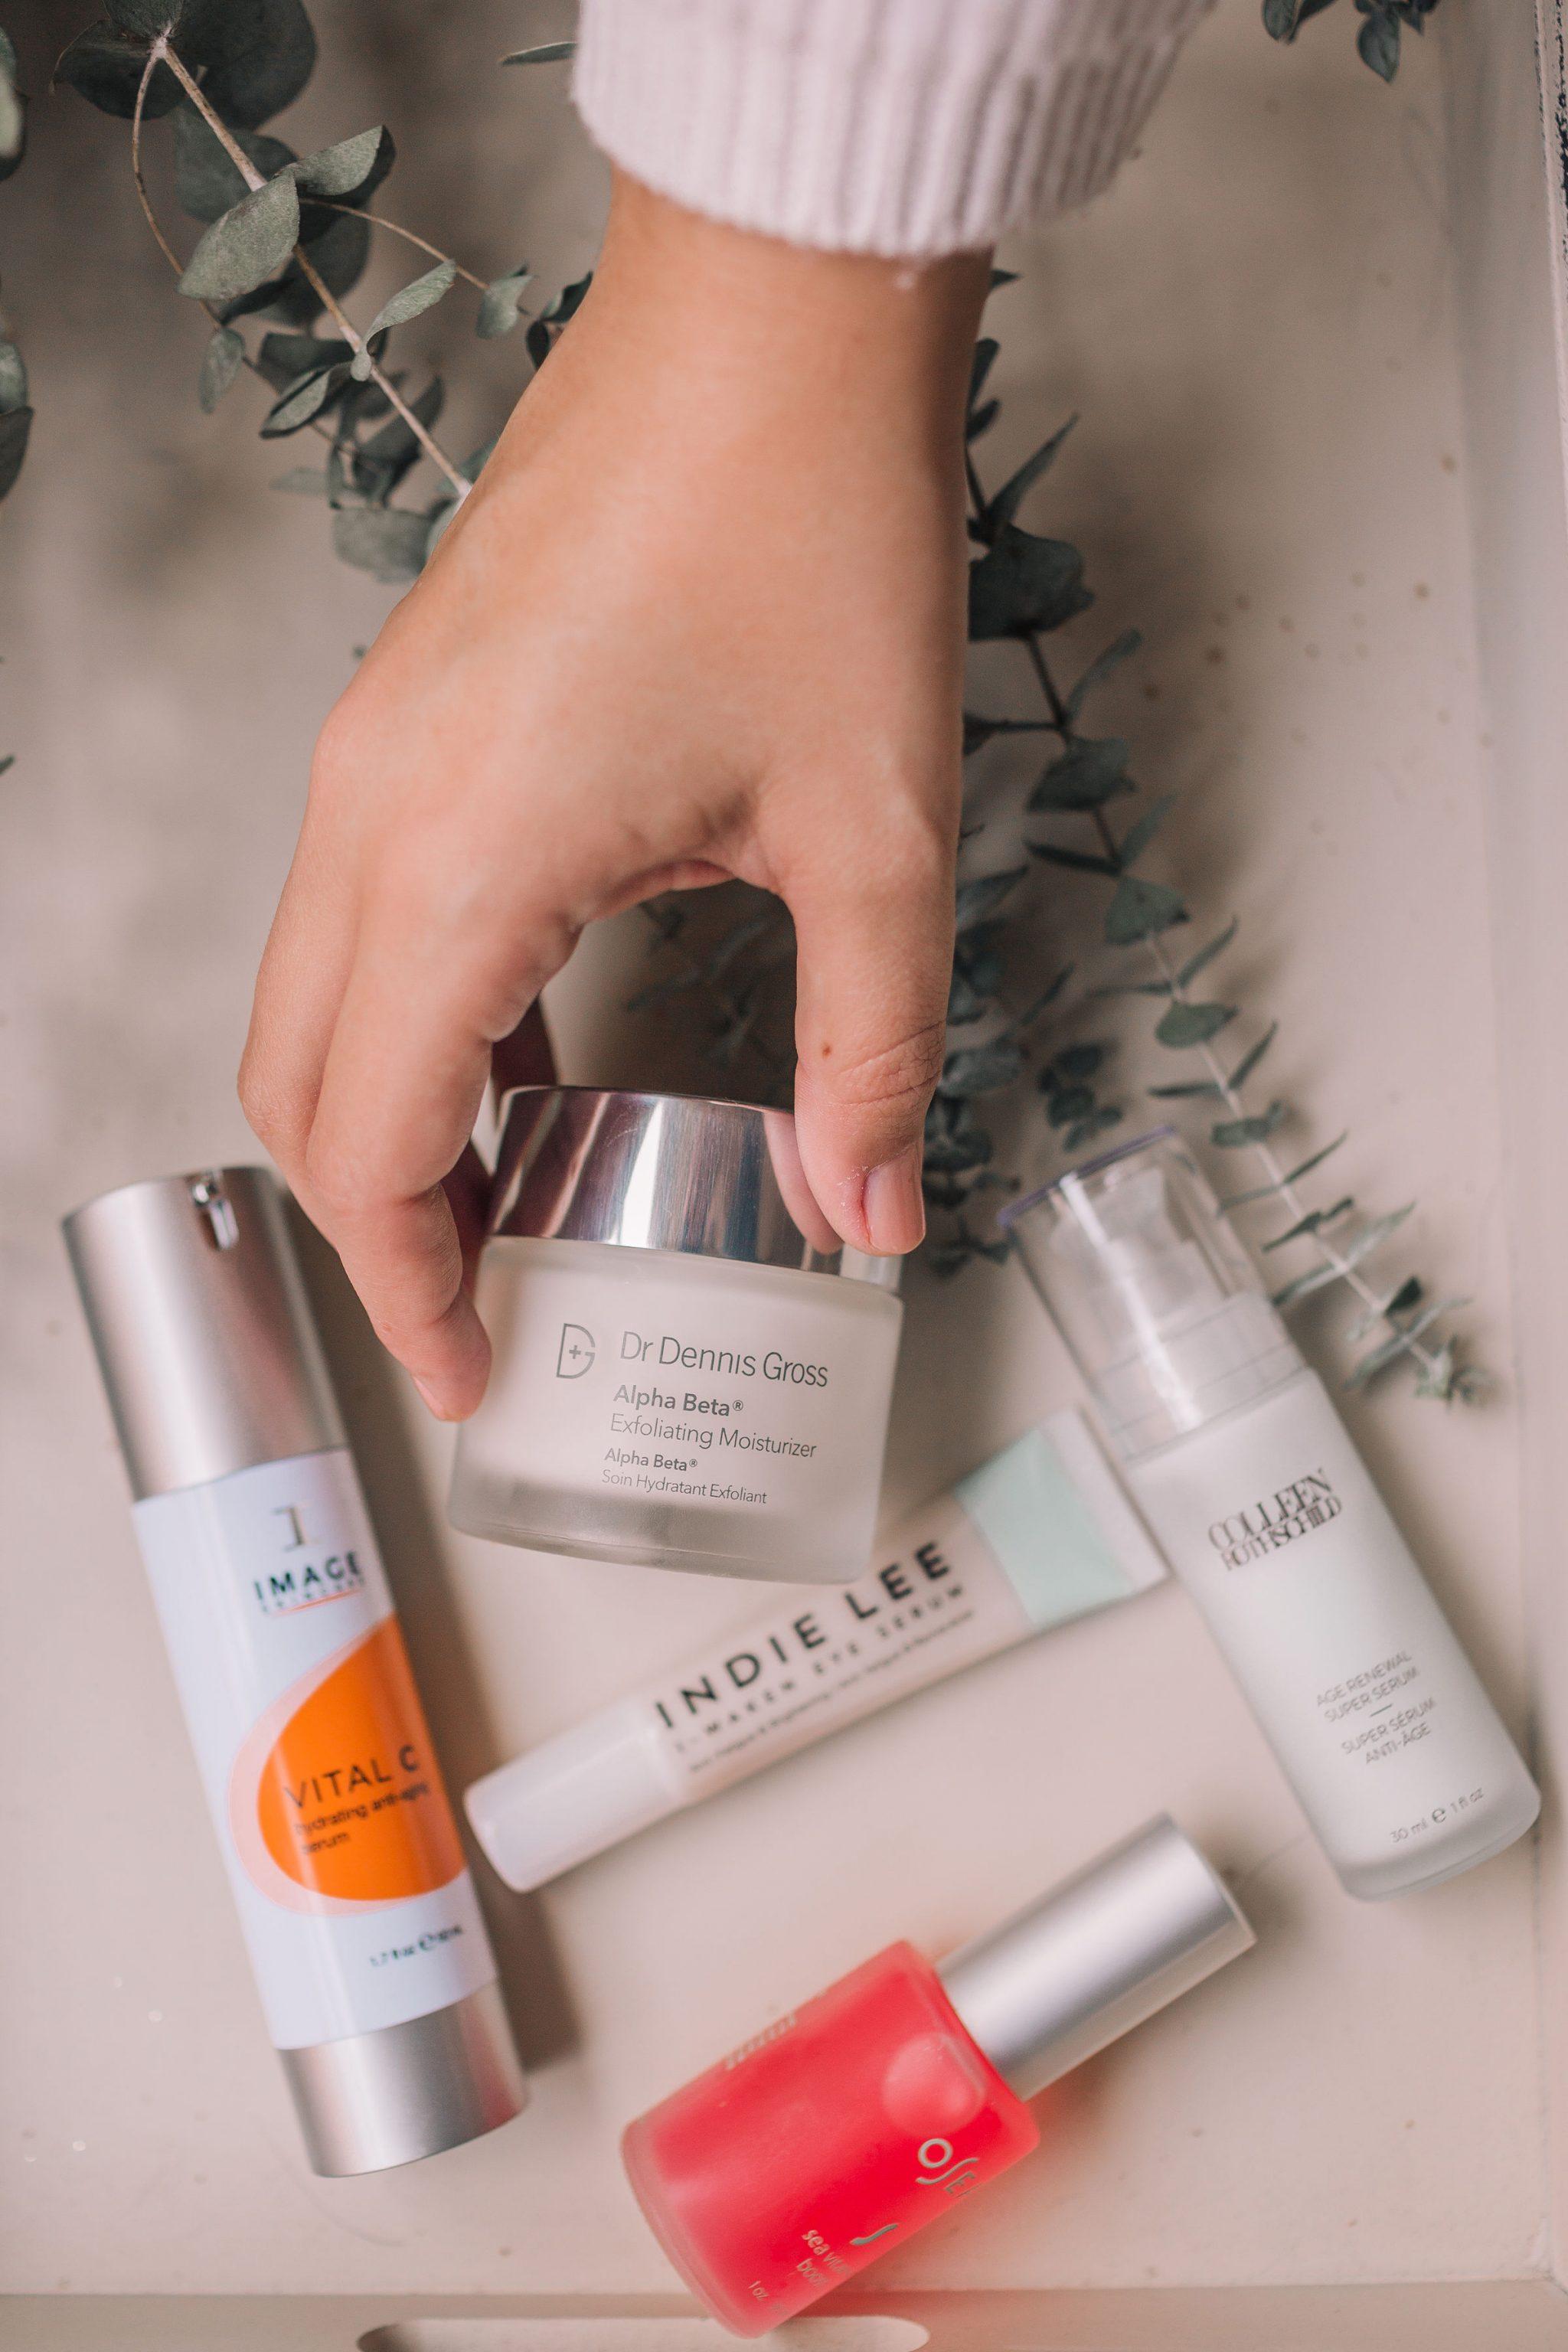 Indie Lee, Osea Malibu clean skincare